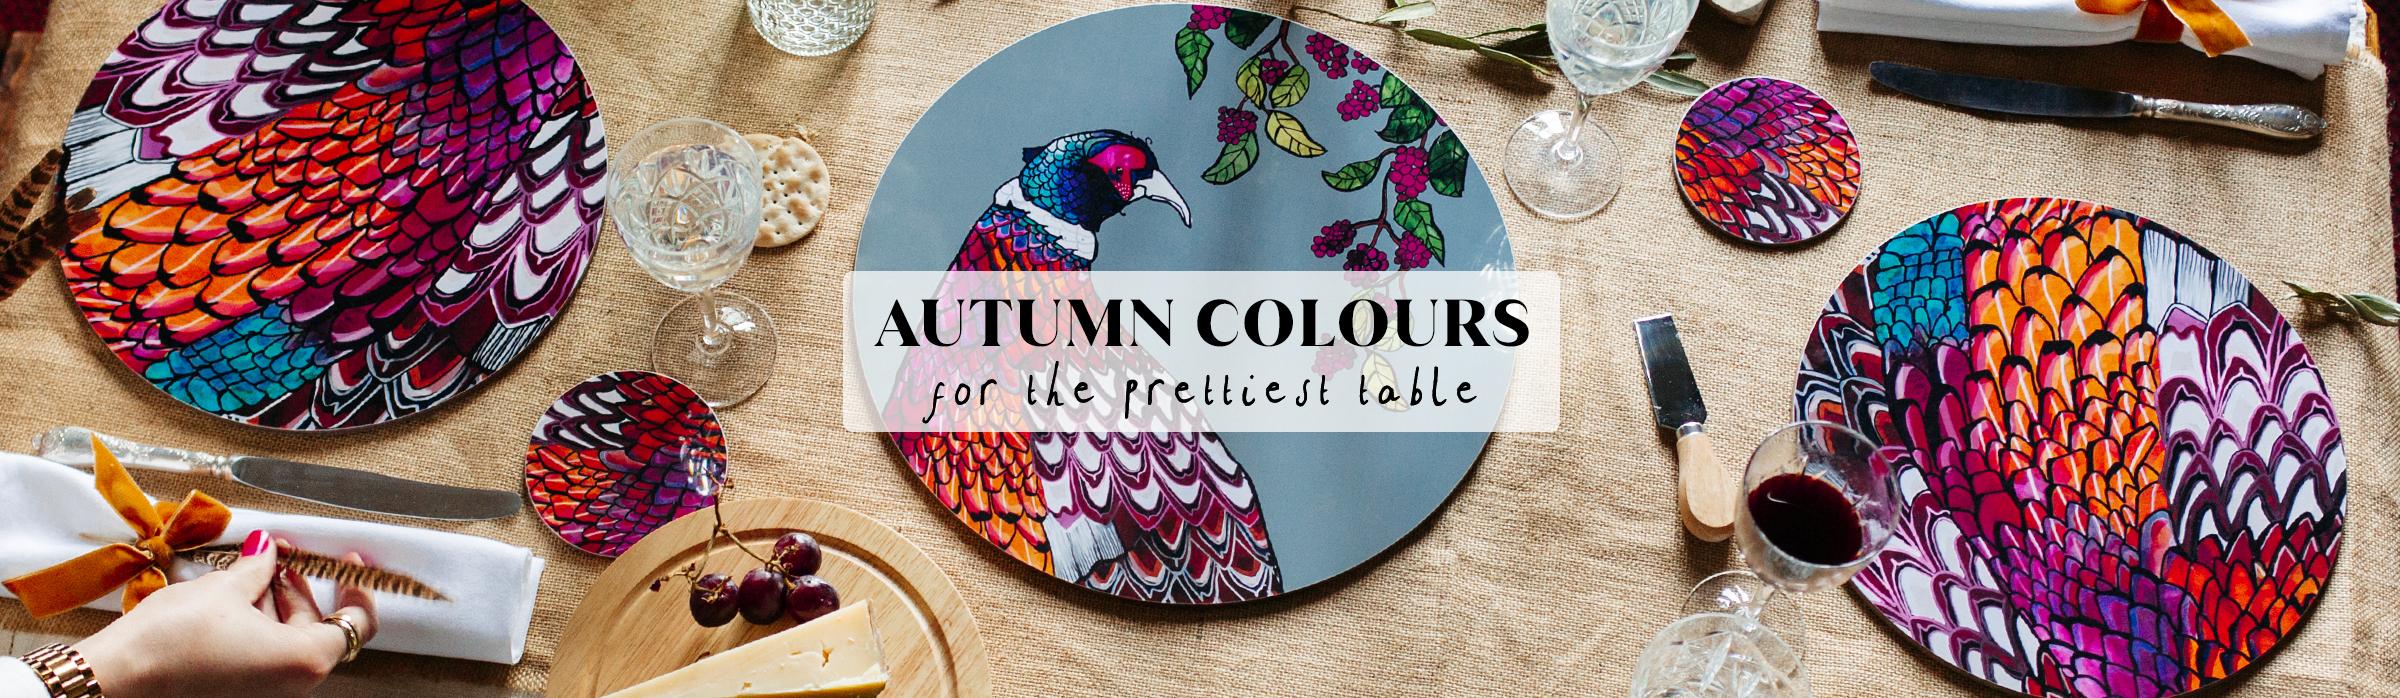 autumn homepage prettiest table